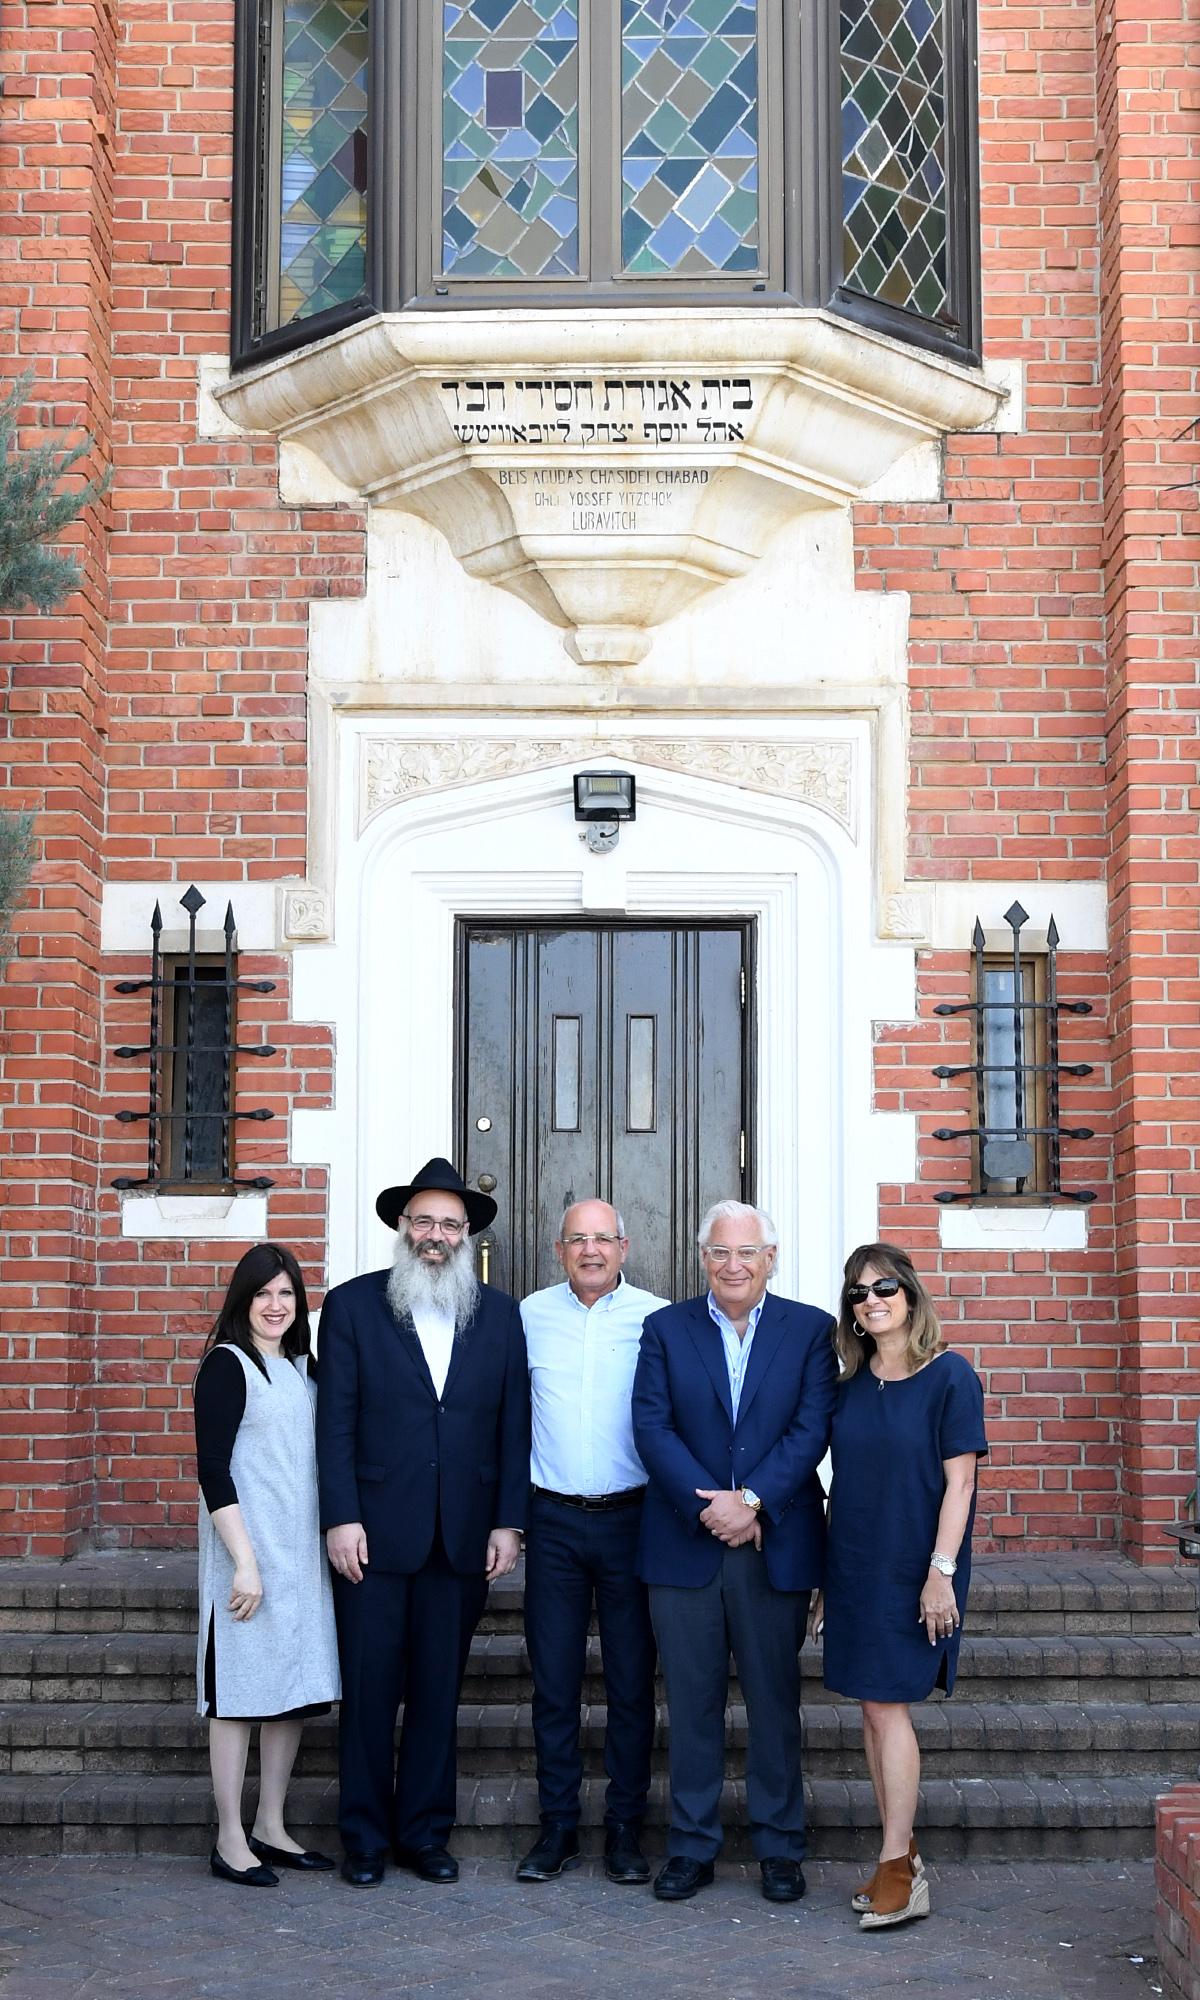 File:Ambassador visit Kfar Chabad 2018 (26049773897) jpg